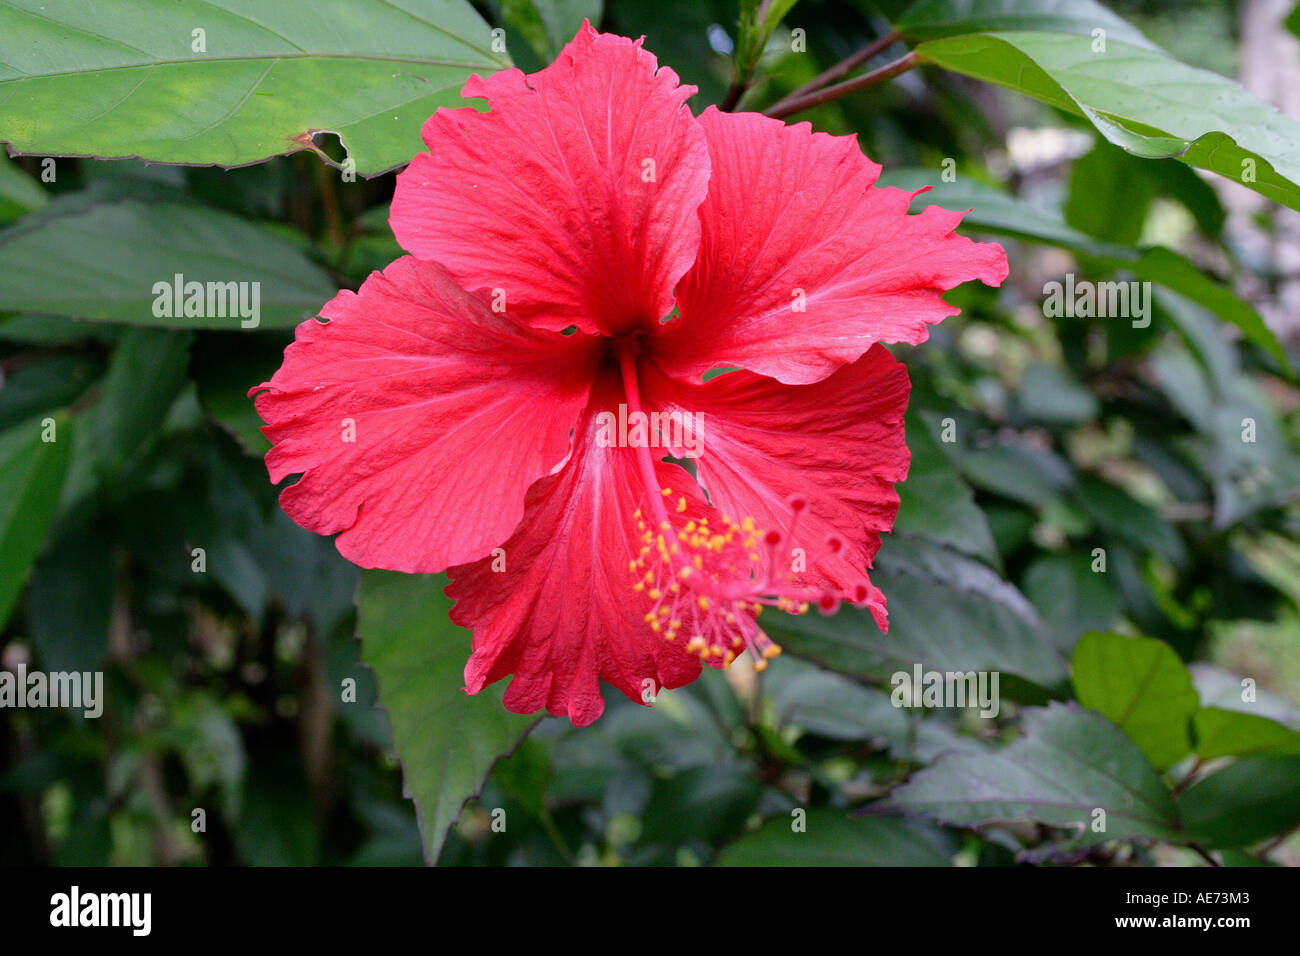 Red hibiscus flower the official state flower of malaysia gunung red hibiscus flower the official state flower of malaysia gunung gading national park sarawak borneo malaysia izmirmasajfo